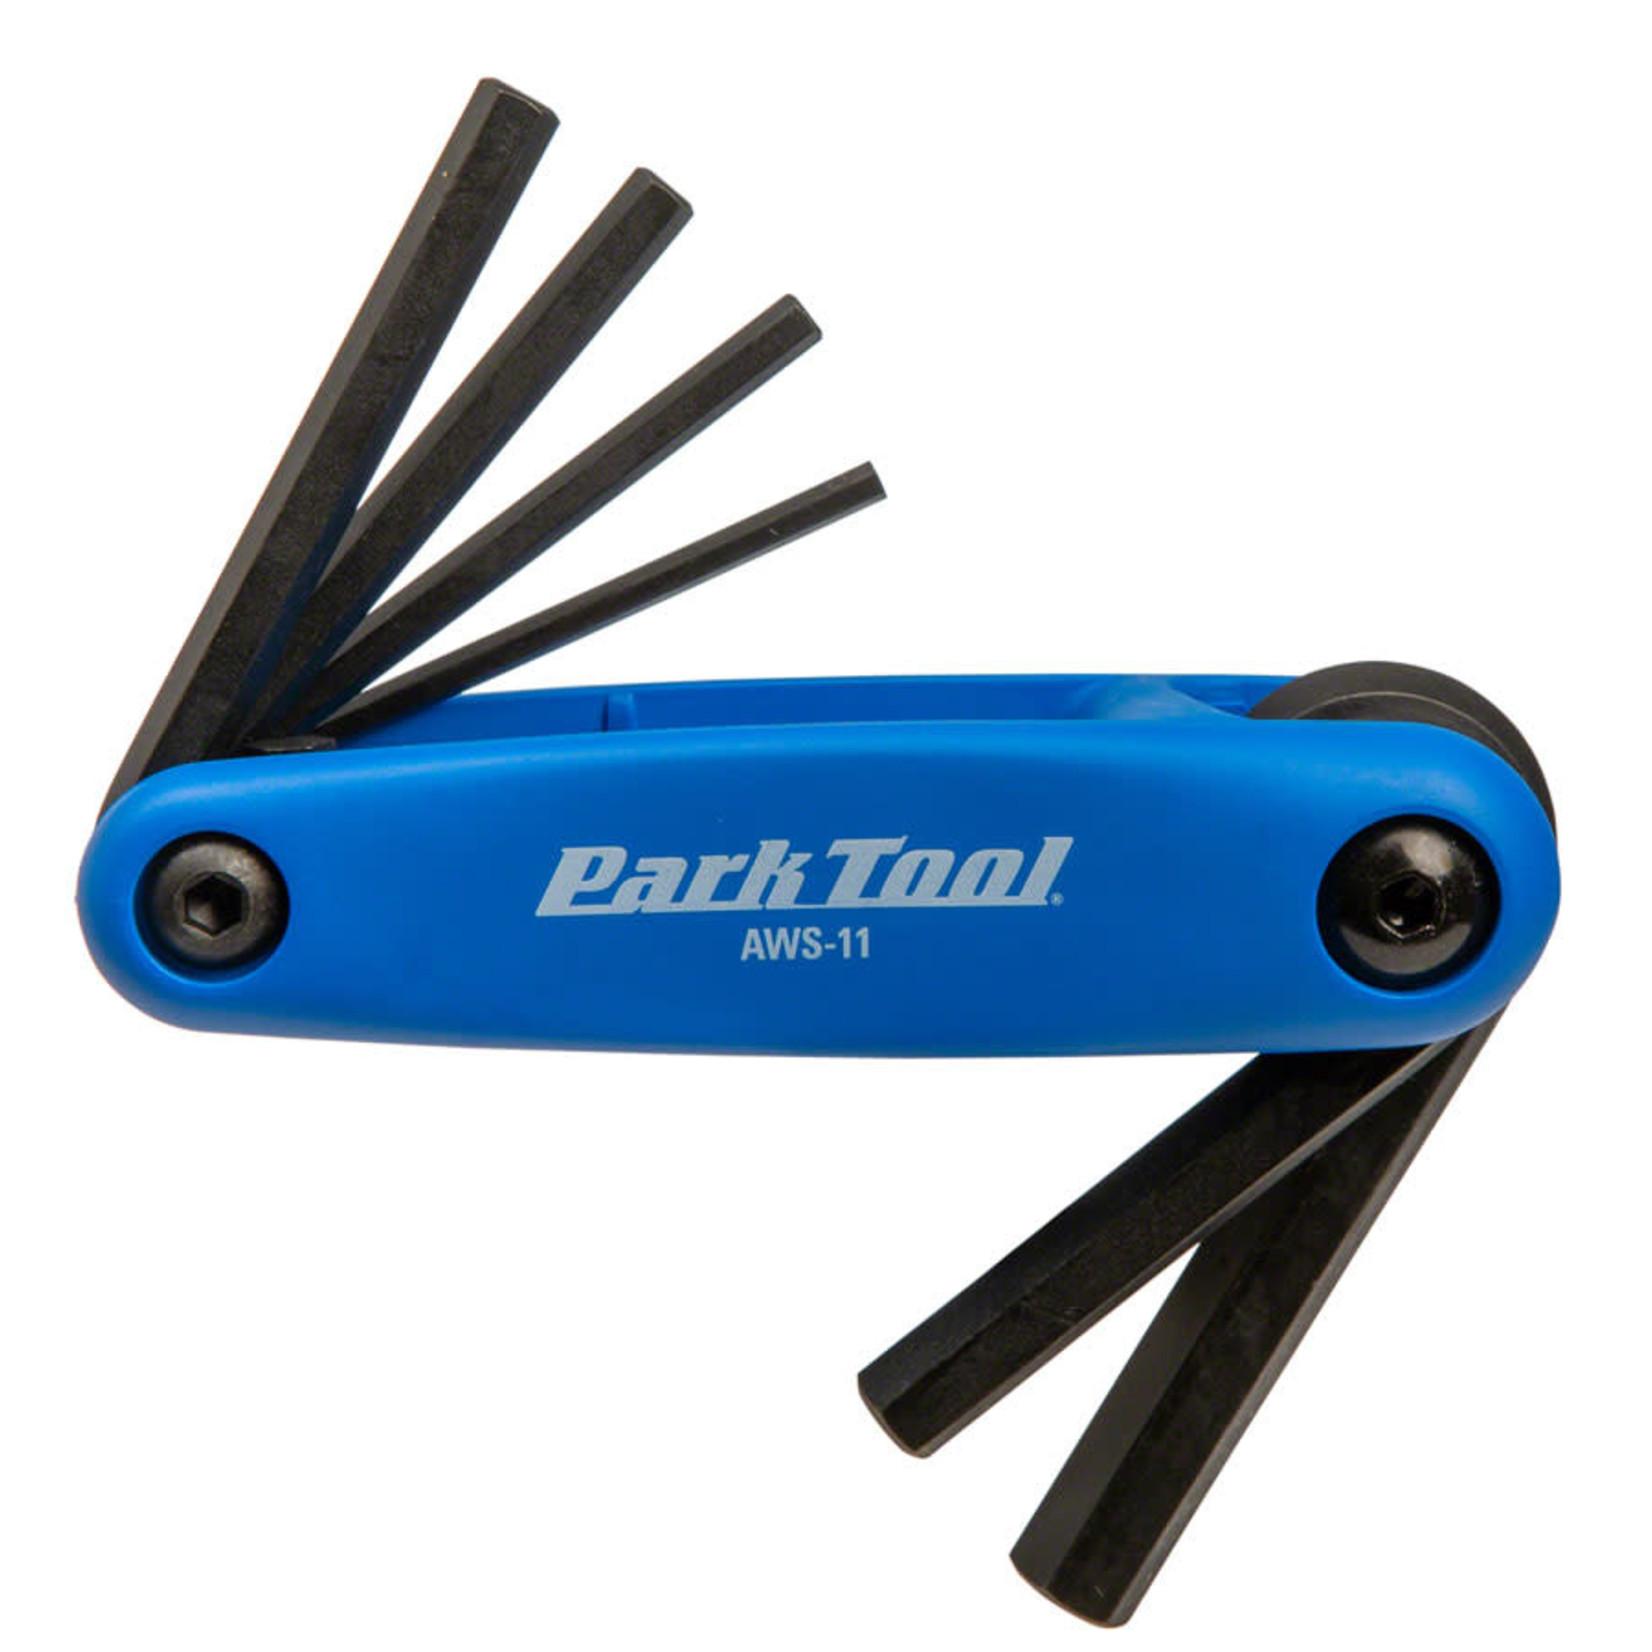 Park Tool Park Tool AWS-11 Metric Folding Hex Wrench Set